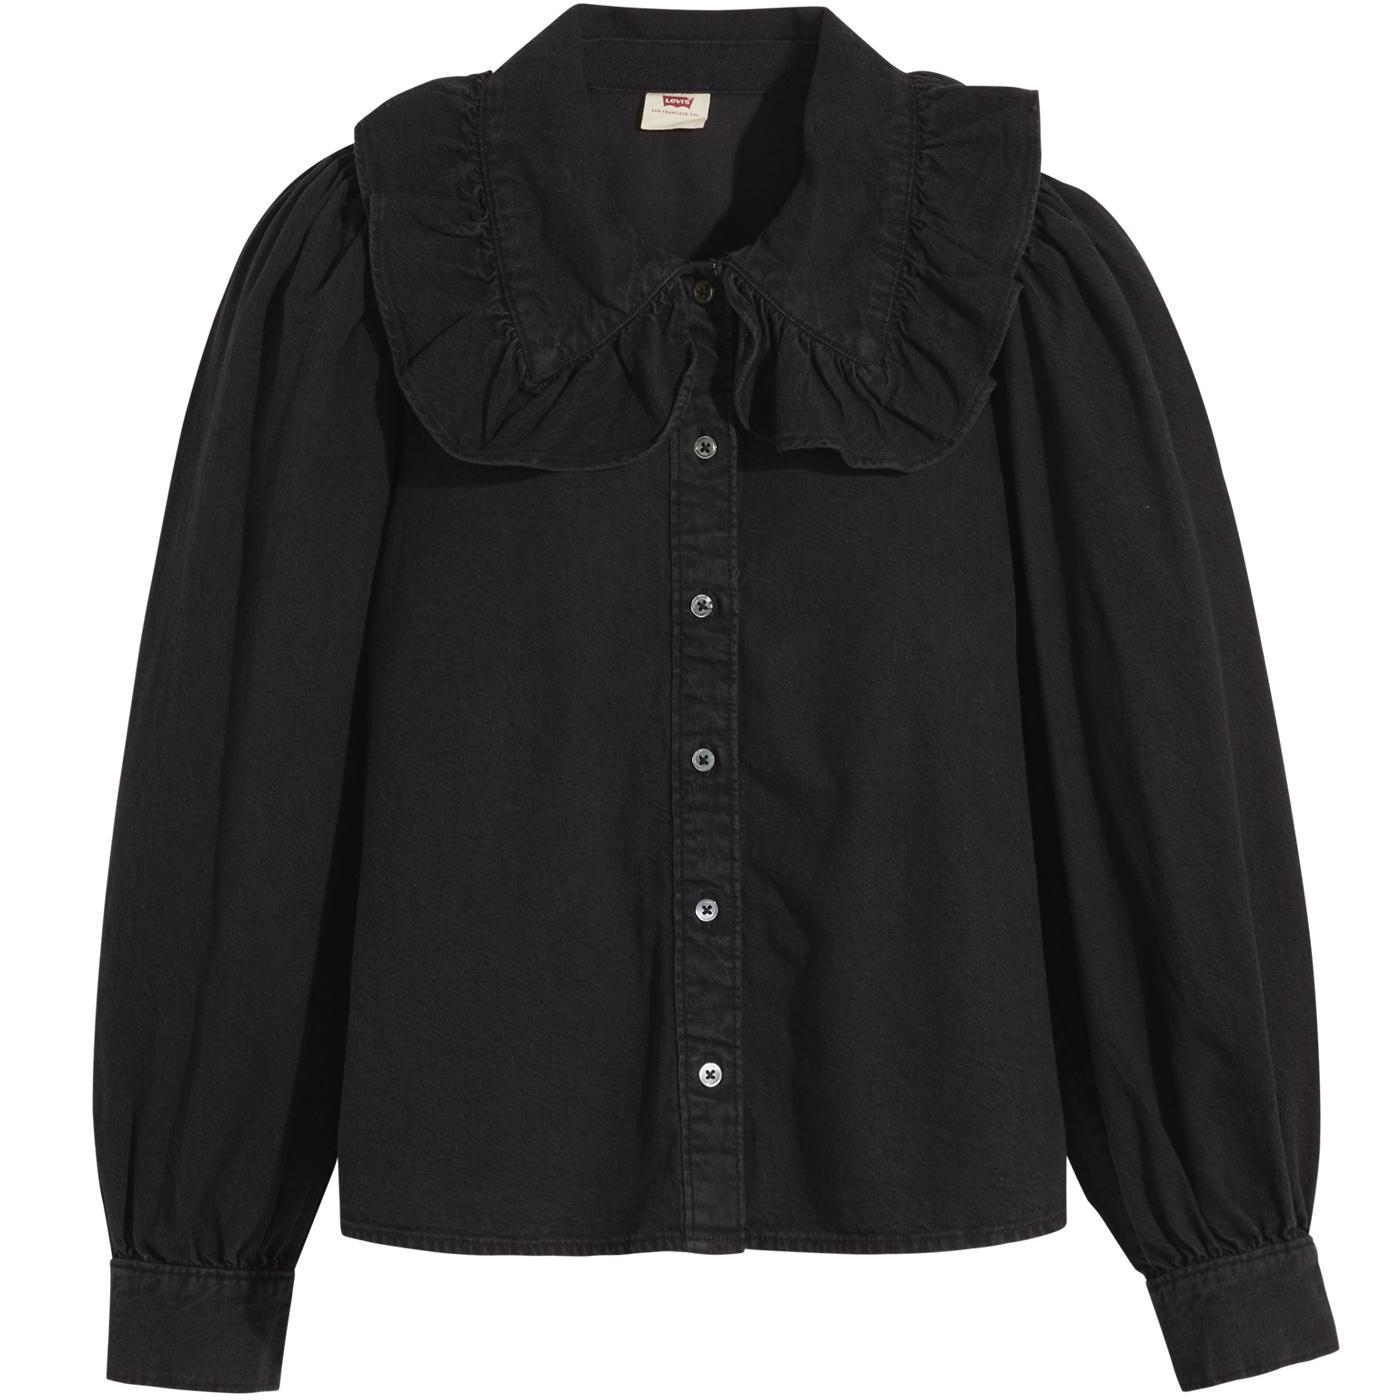 Emilie LEVI'S Retro 70s Frill Collar Shirt